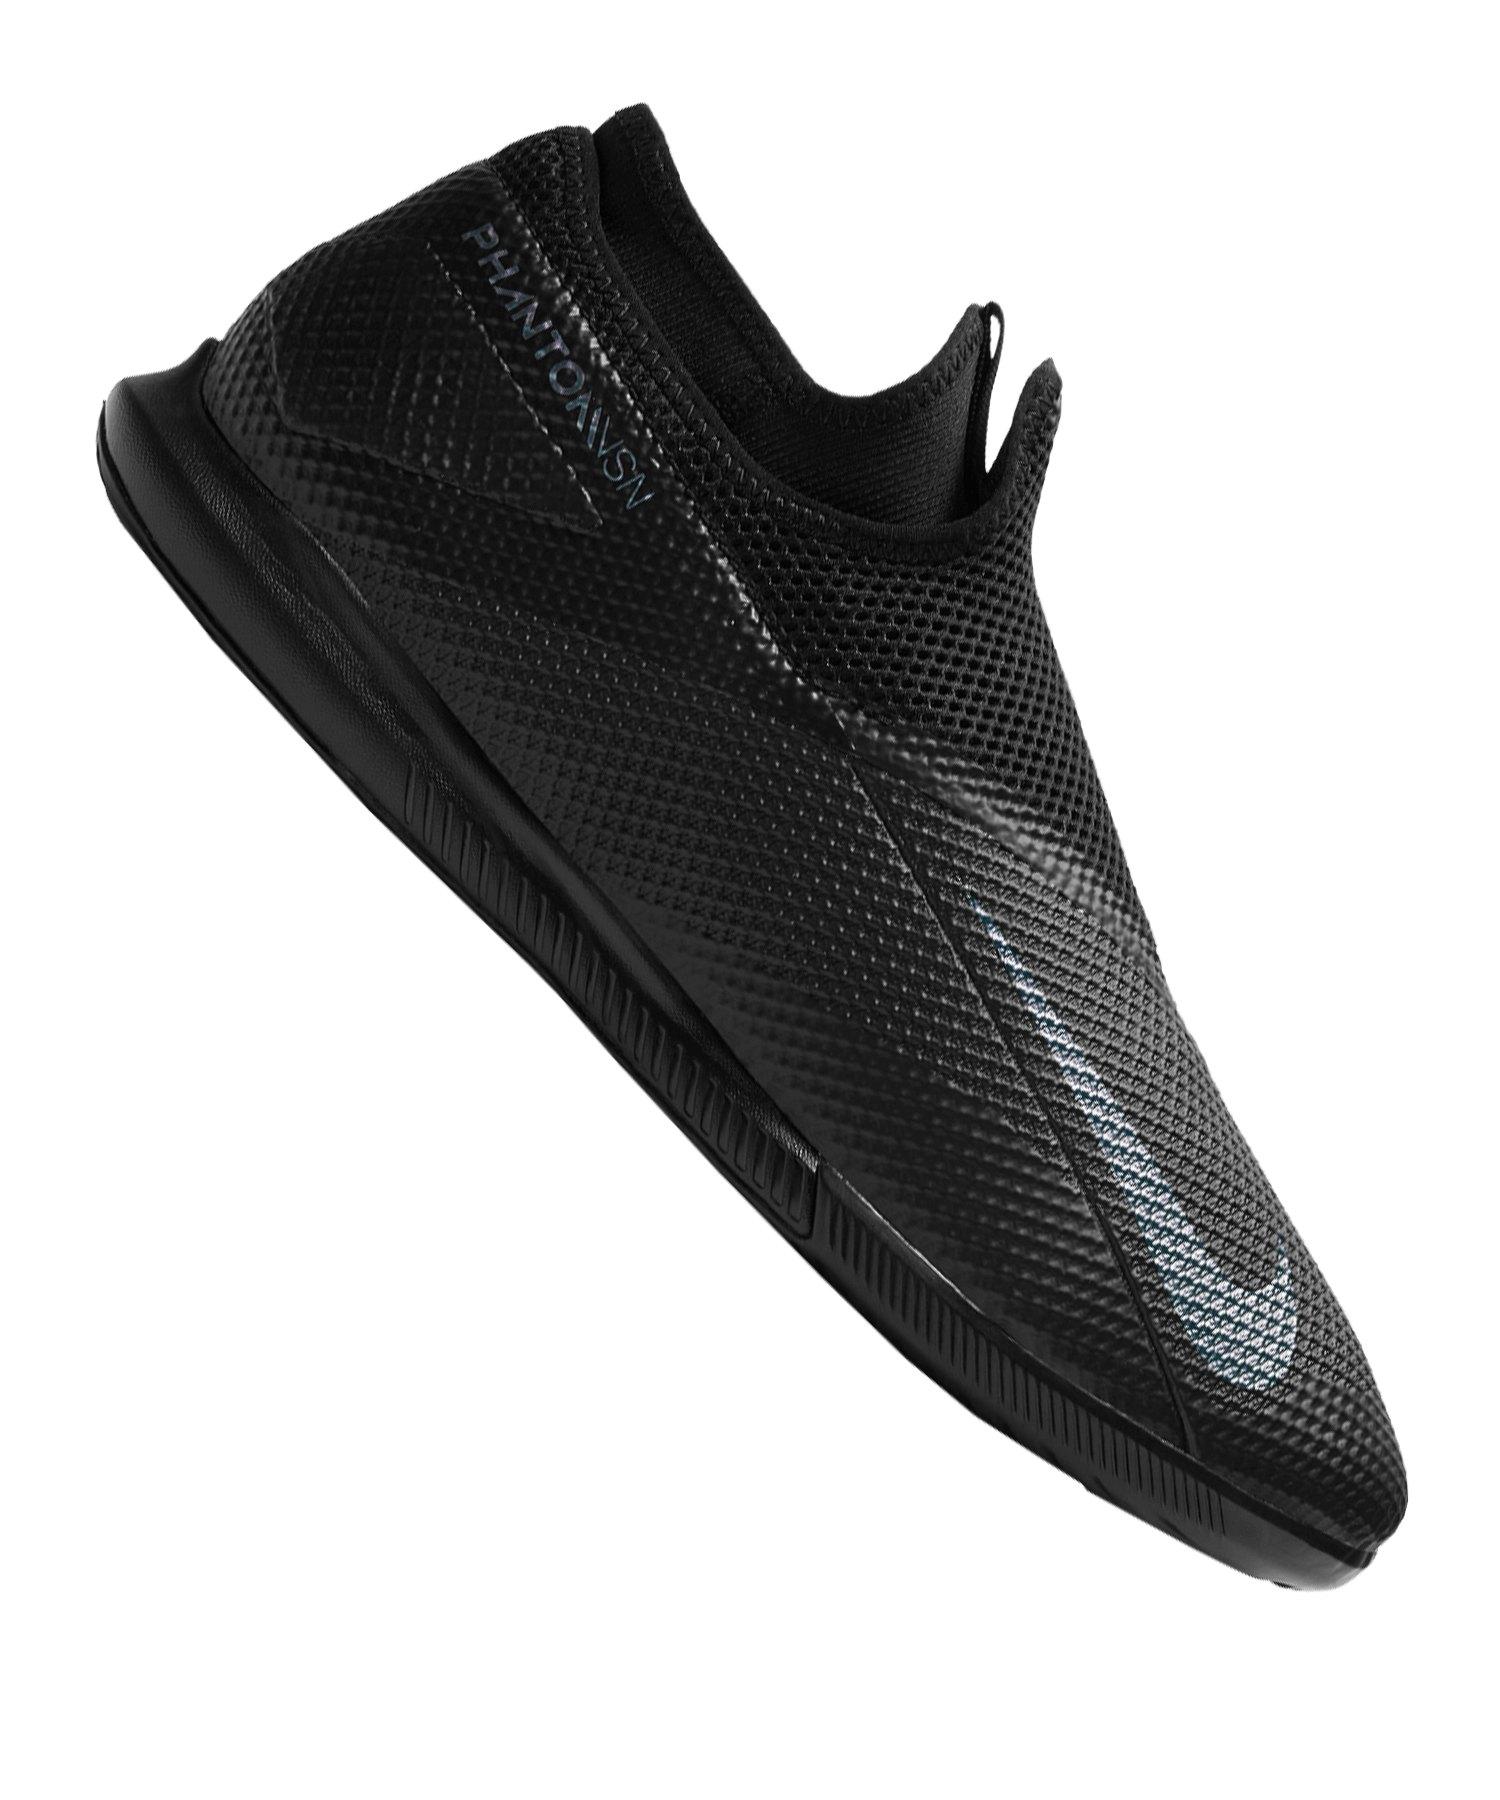 Nike Phantom Vision II Kinetic Black Academy DF IC Schwarz F010 - schwarz